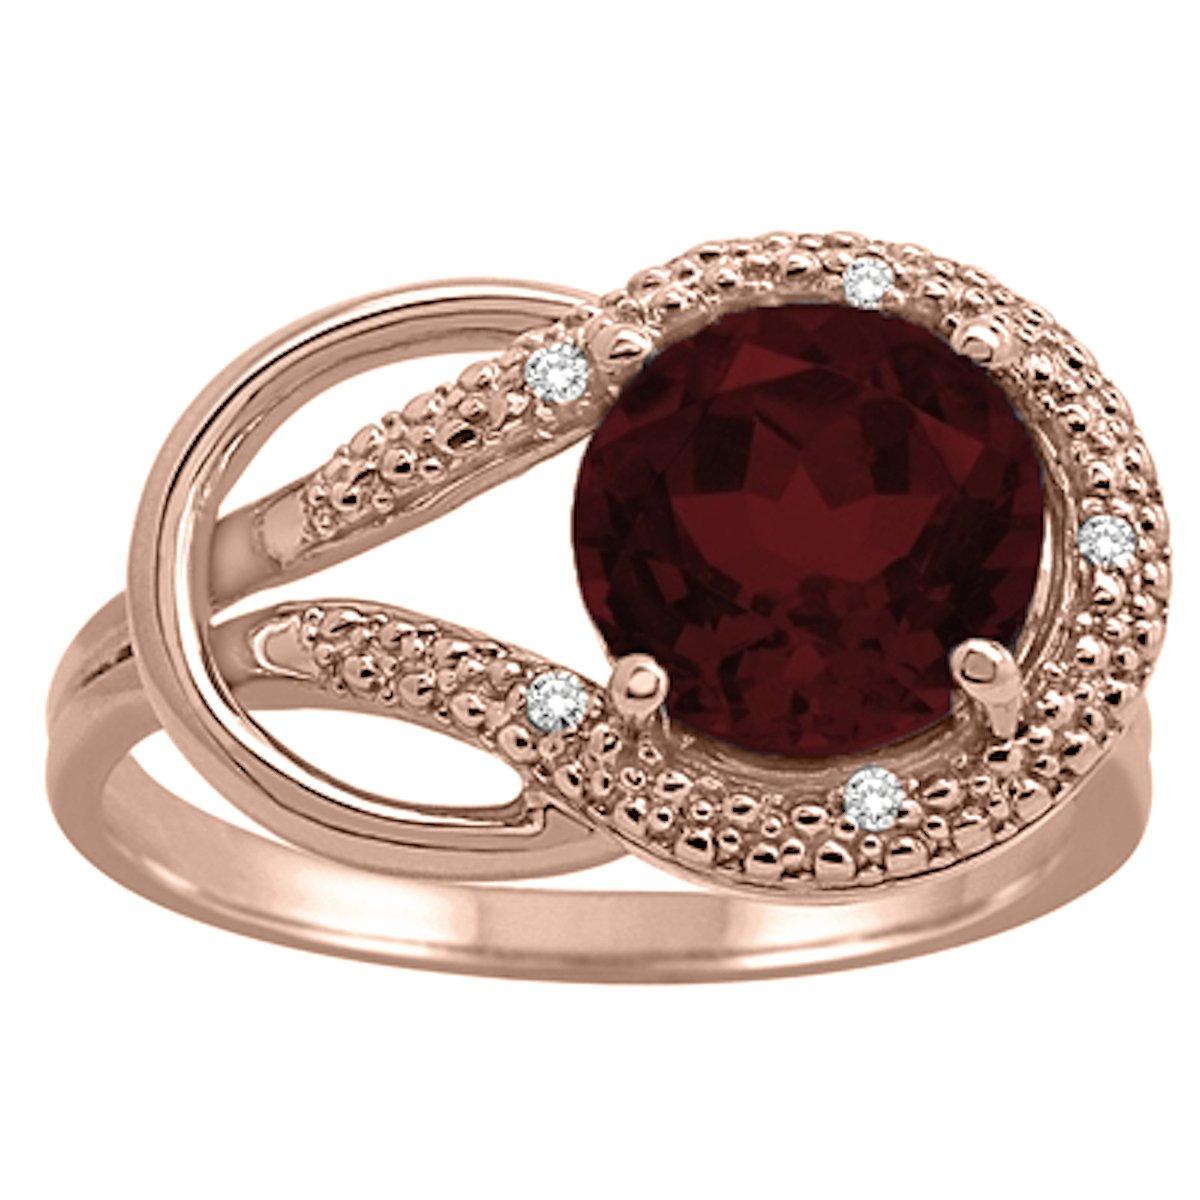 Garnet and Diamond Love Knot Ring in 10K Rose Gold